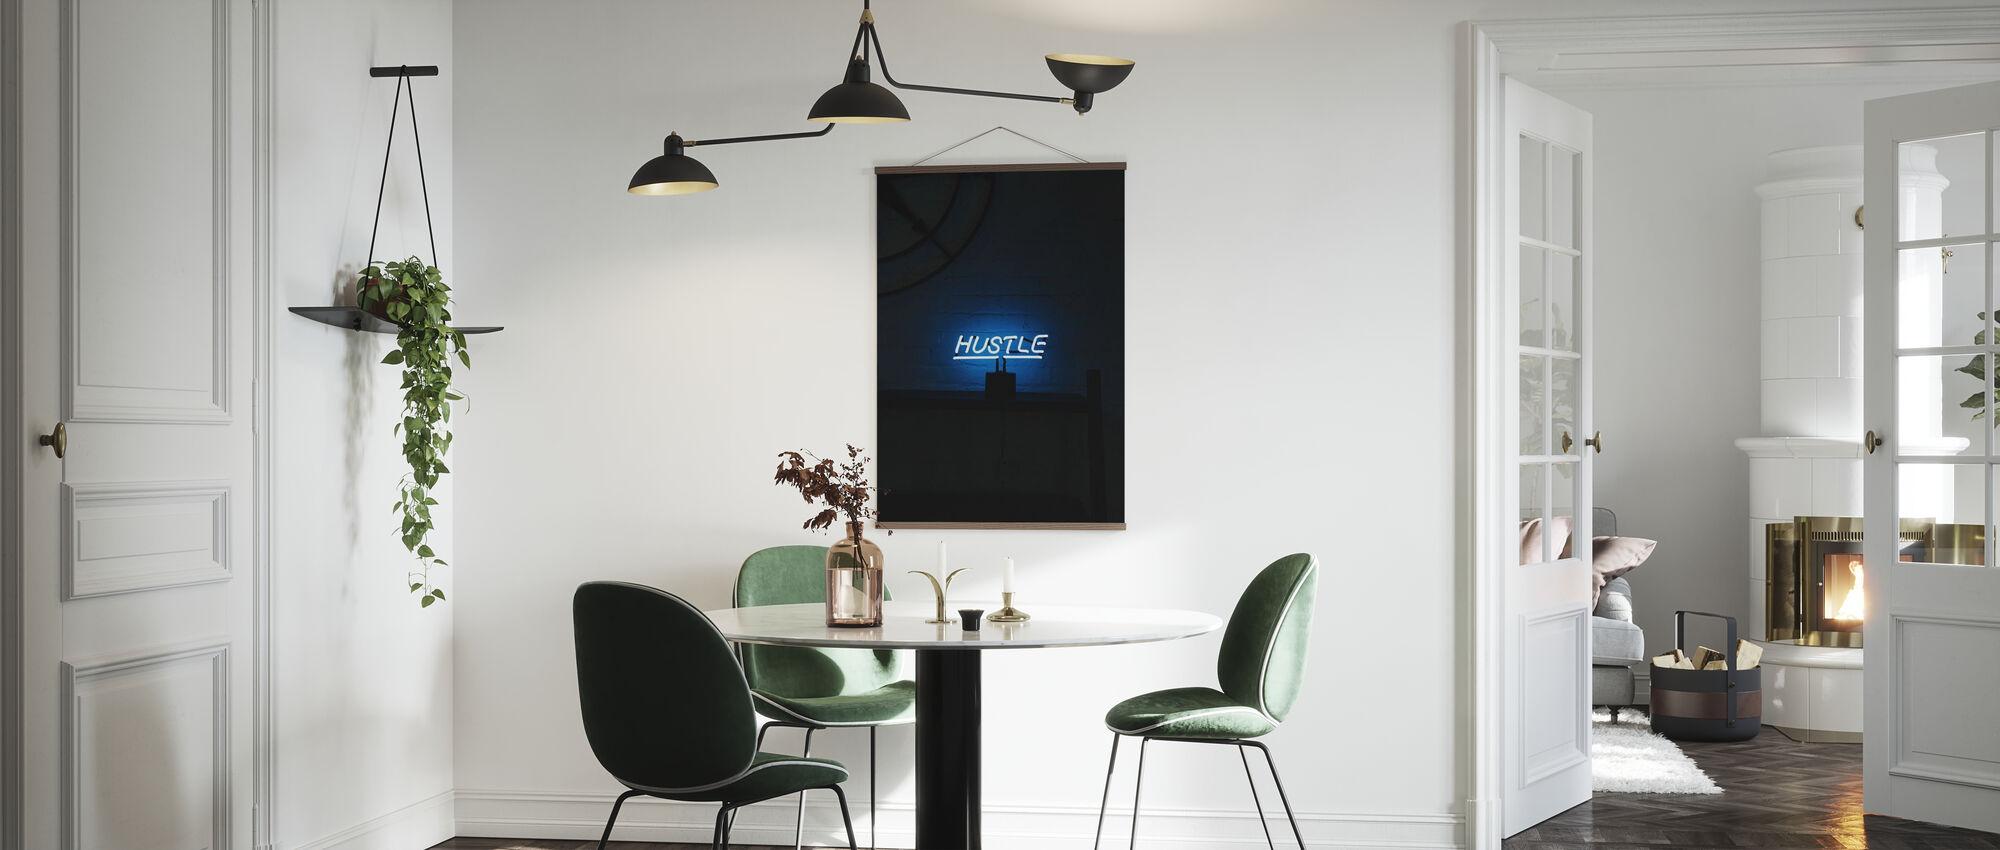 Hustle Neon Sign - Poster - Kitchen